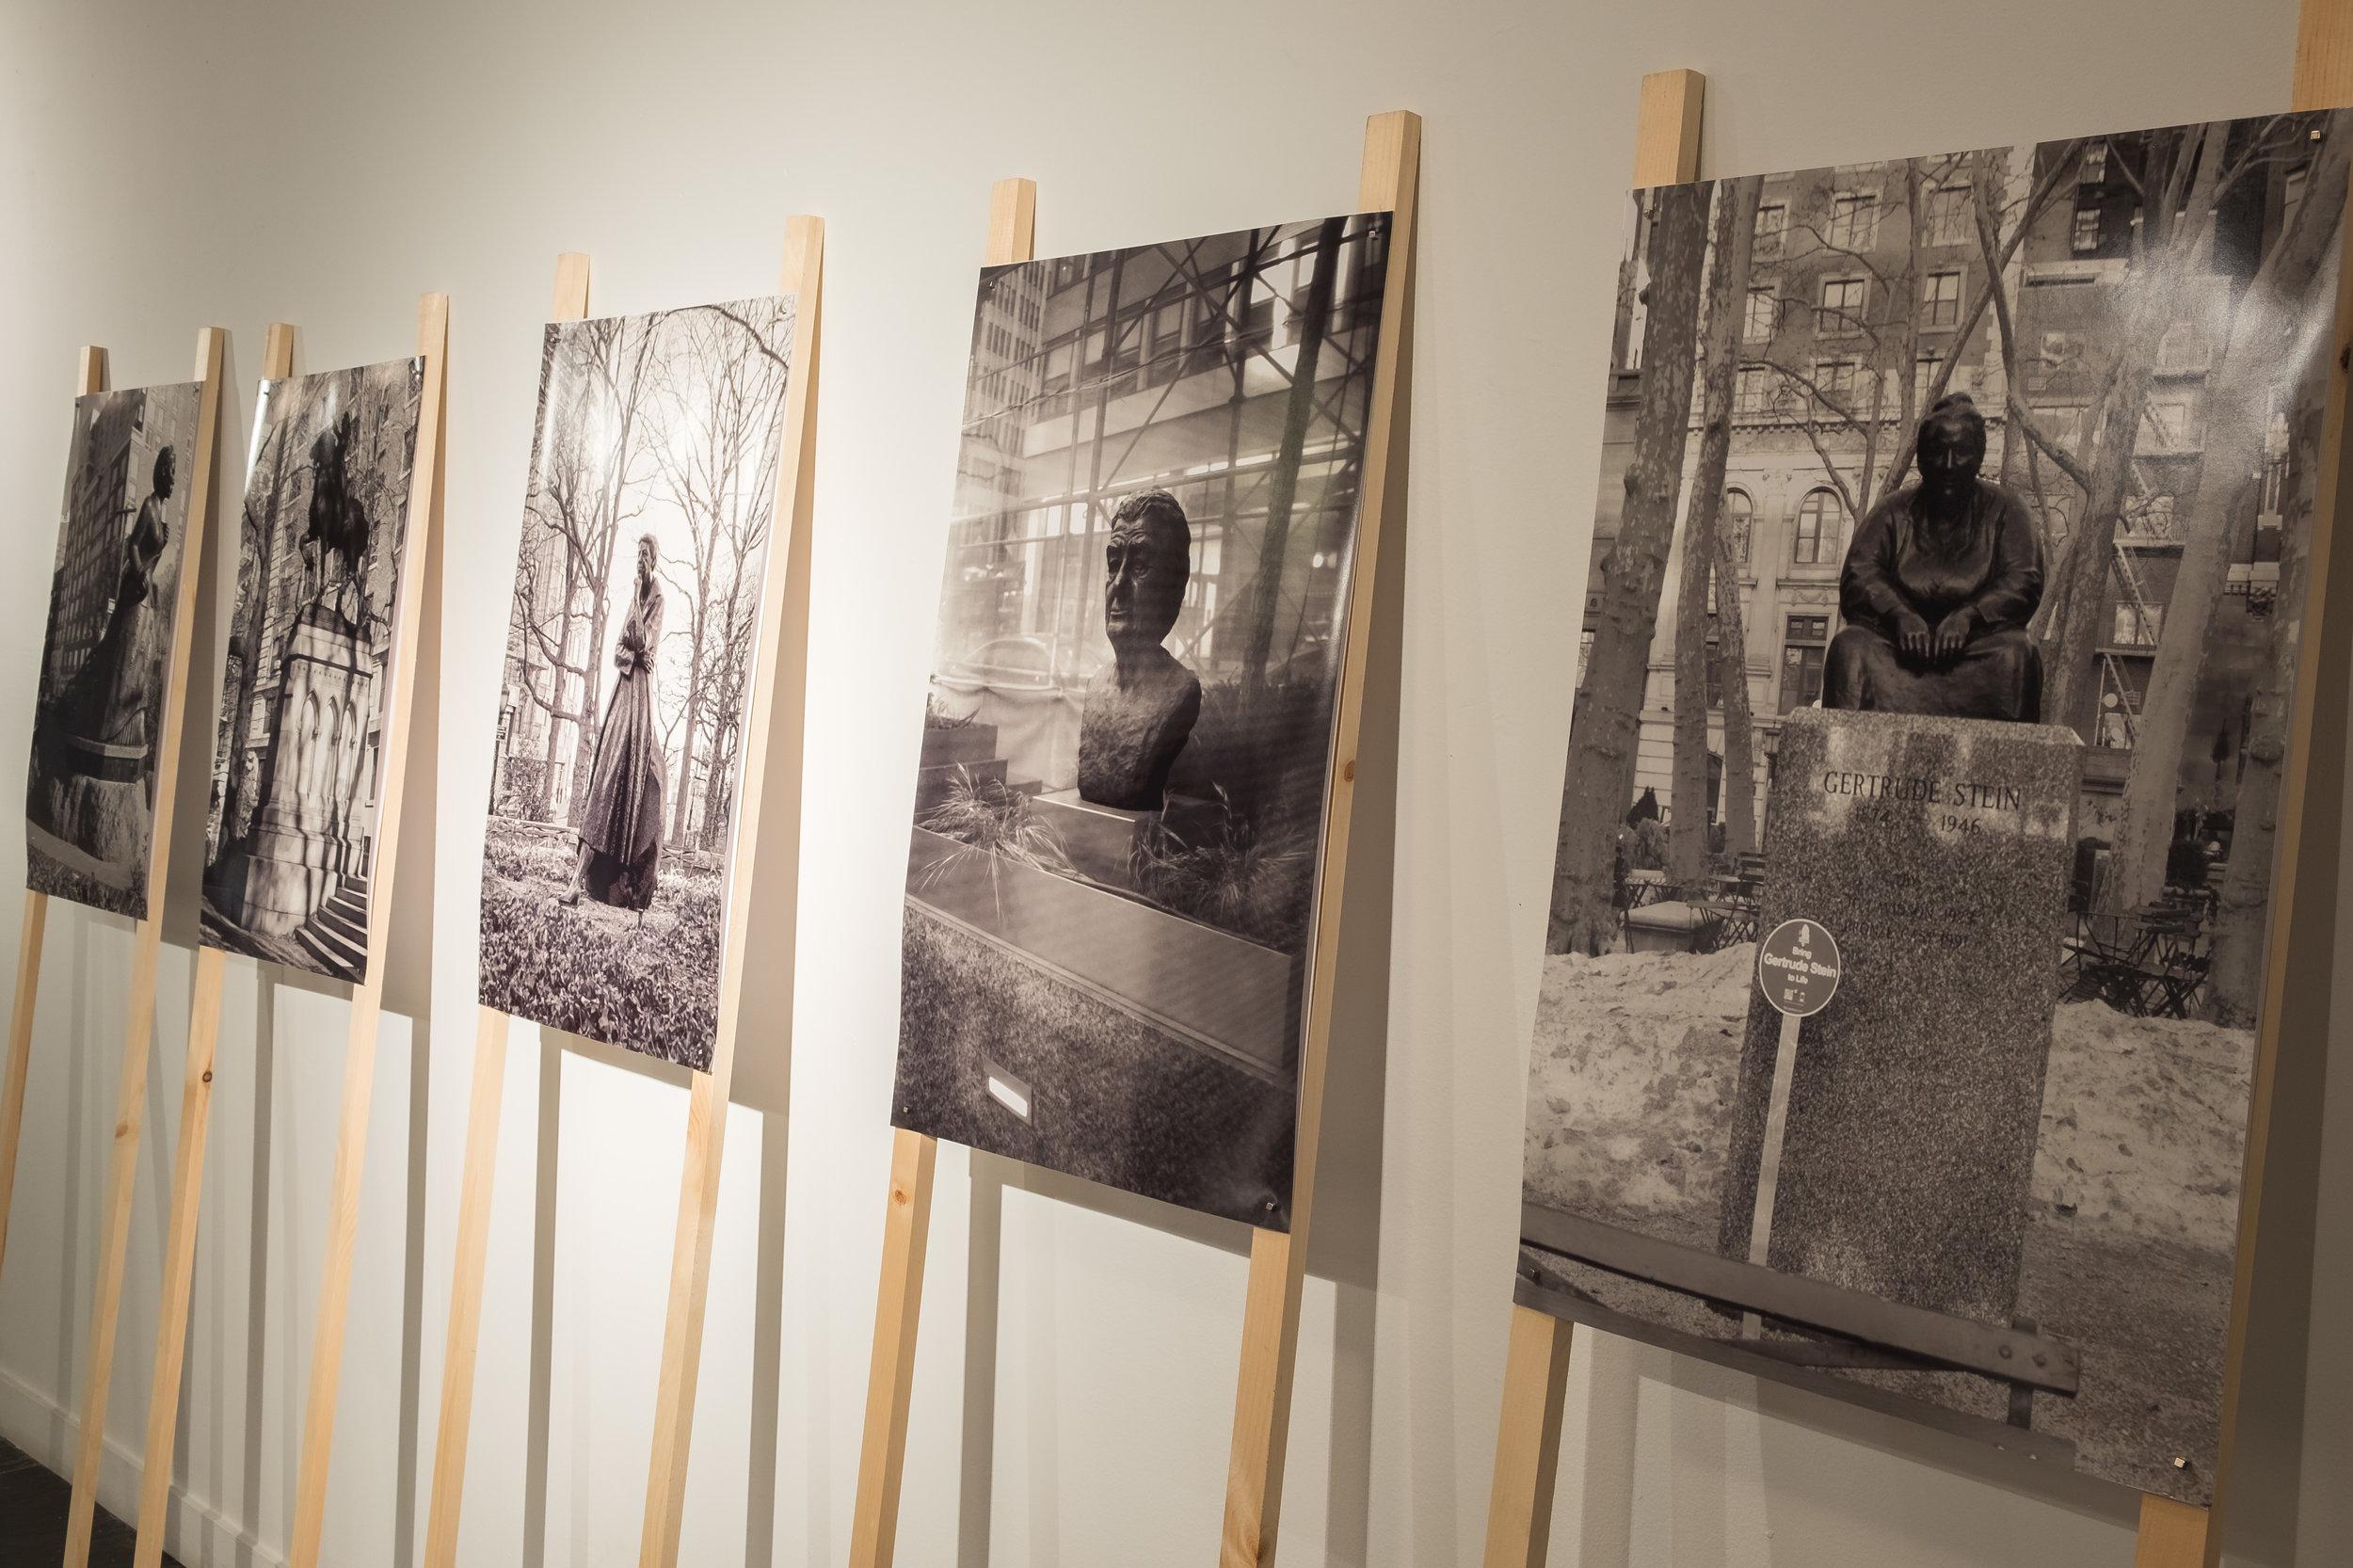 Black& White Photography, digital print. Dimensions: 20 x 30 in (each)